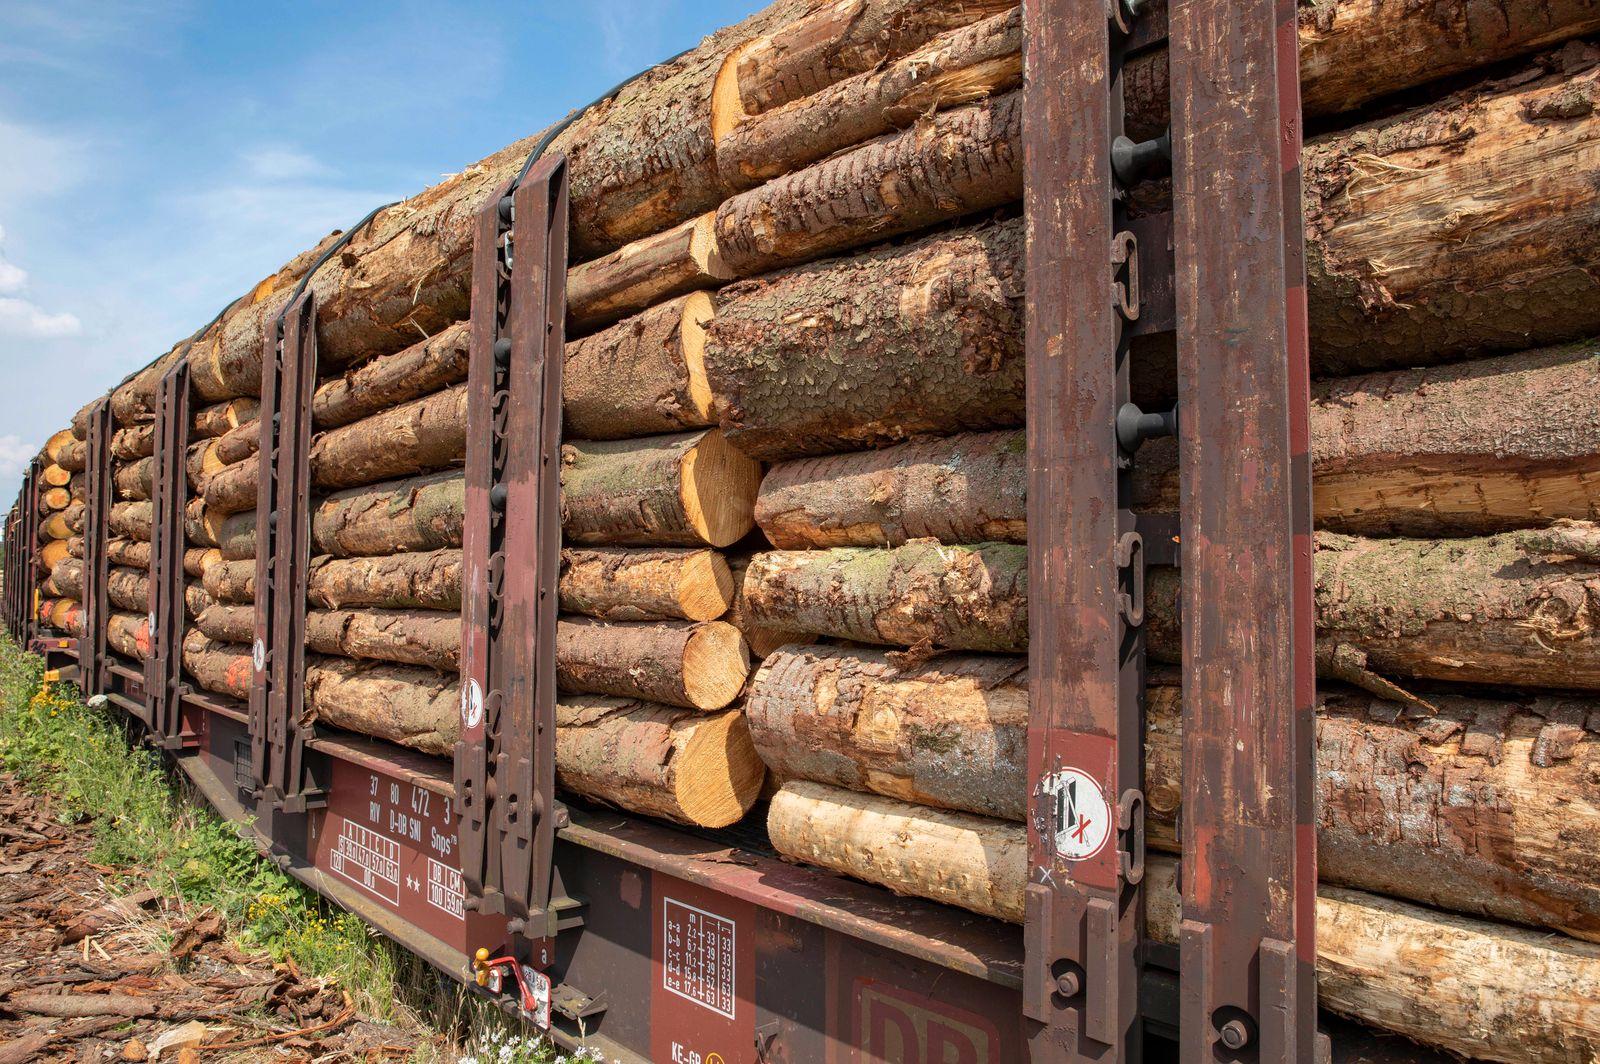 Holzpreis Bauholz in Deutschland teuer, Holzmangel trotz ...